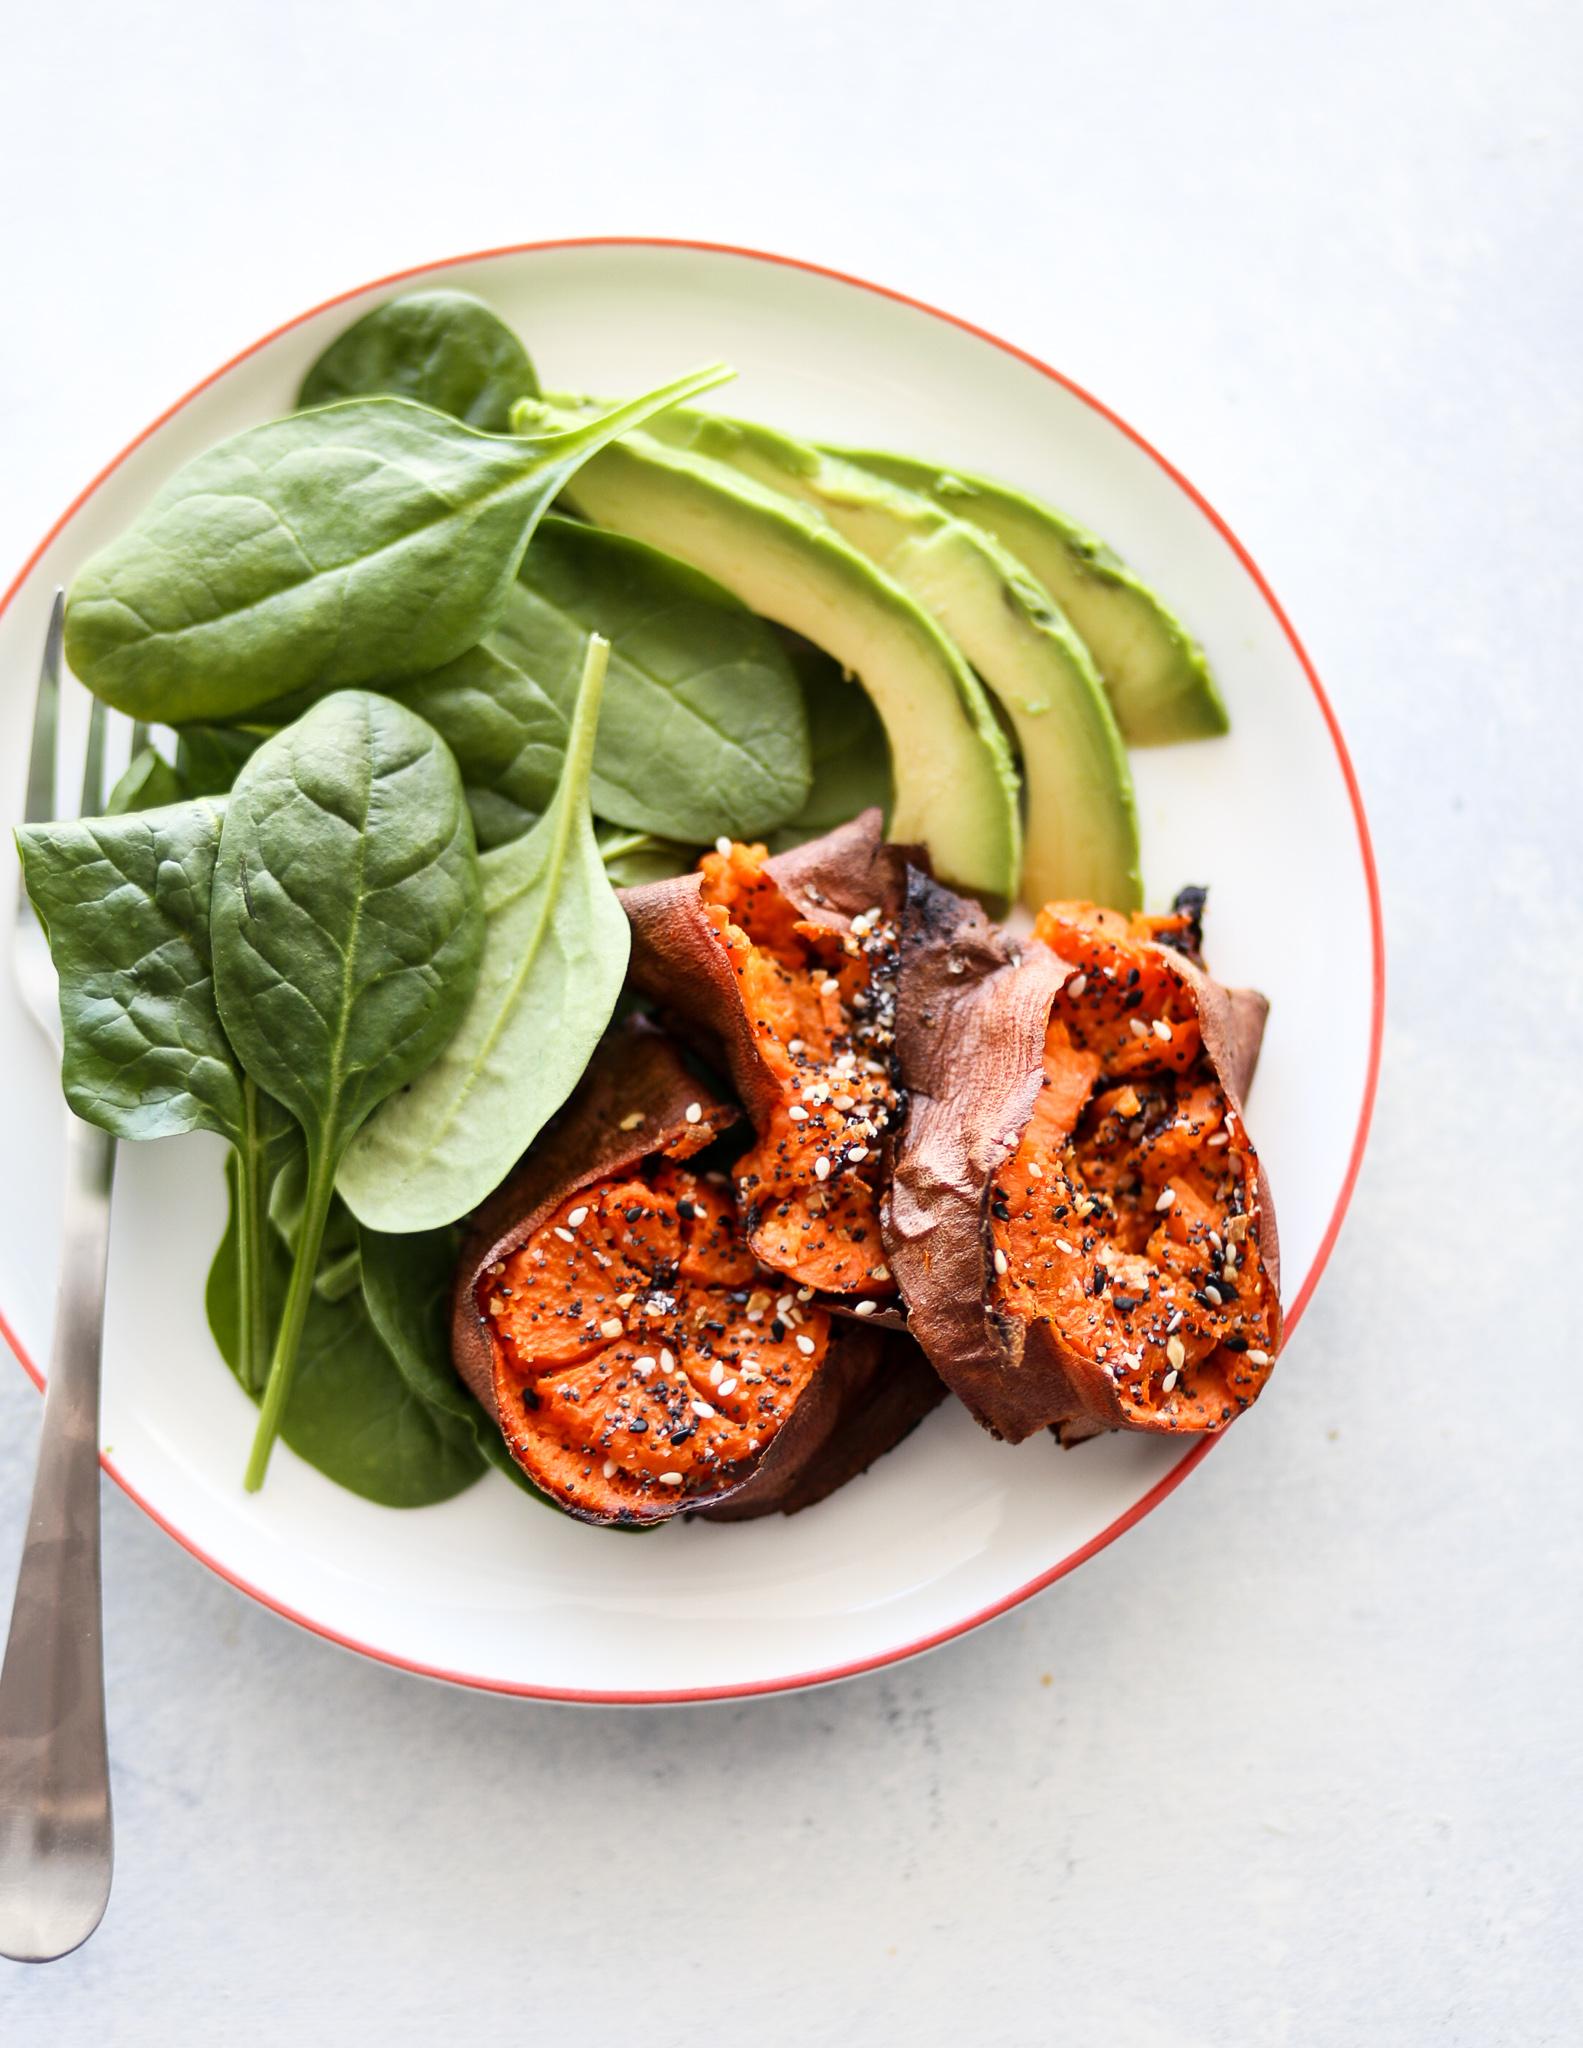 Everything Bagel Smashed Sweet Potatoes | Set the Table #setthetableblog #whole30 #healthyrecipes #easyrecipes #sweetpotatoes #glutenfree #dairyfree